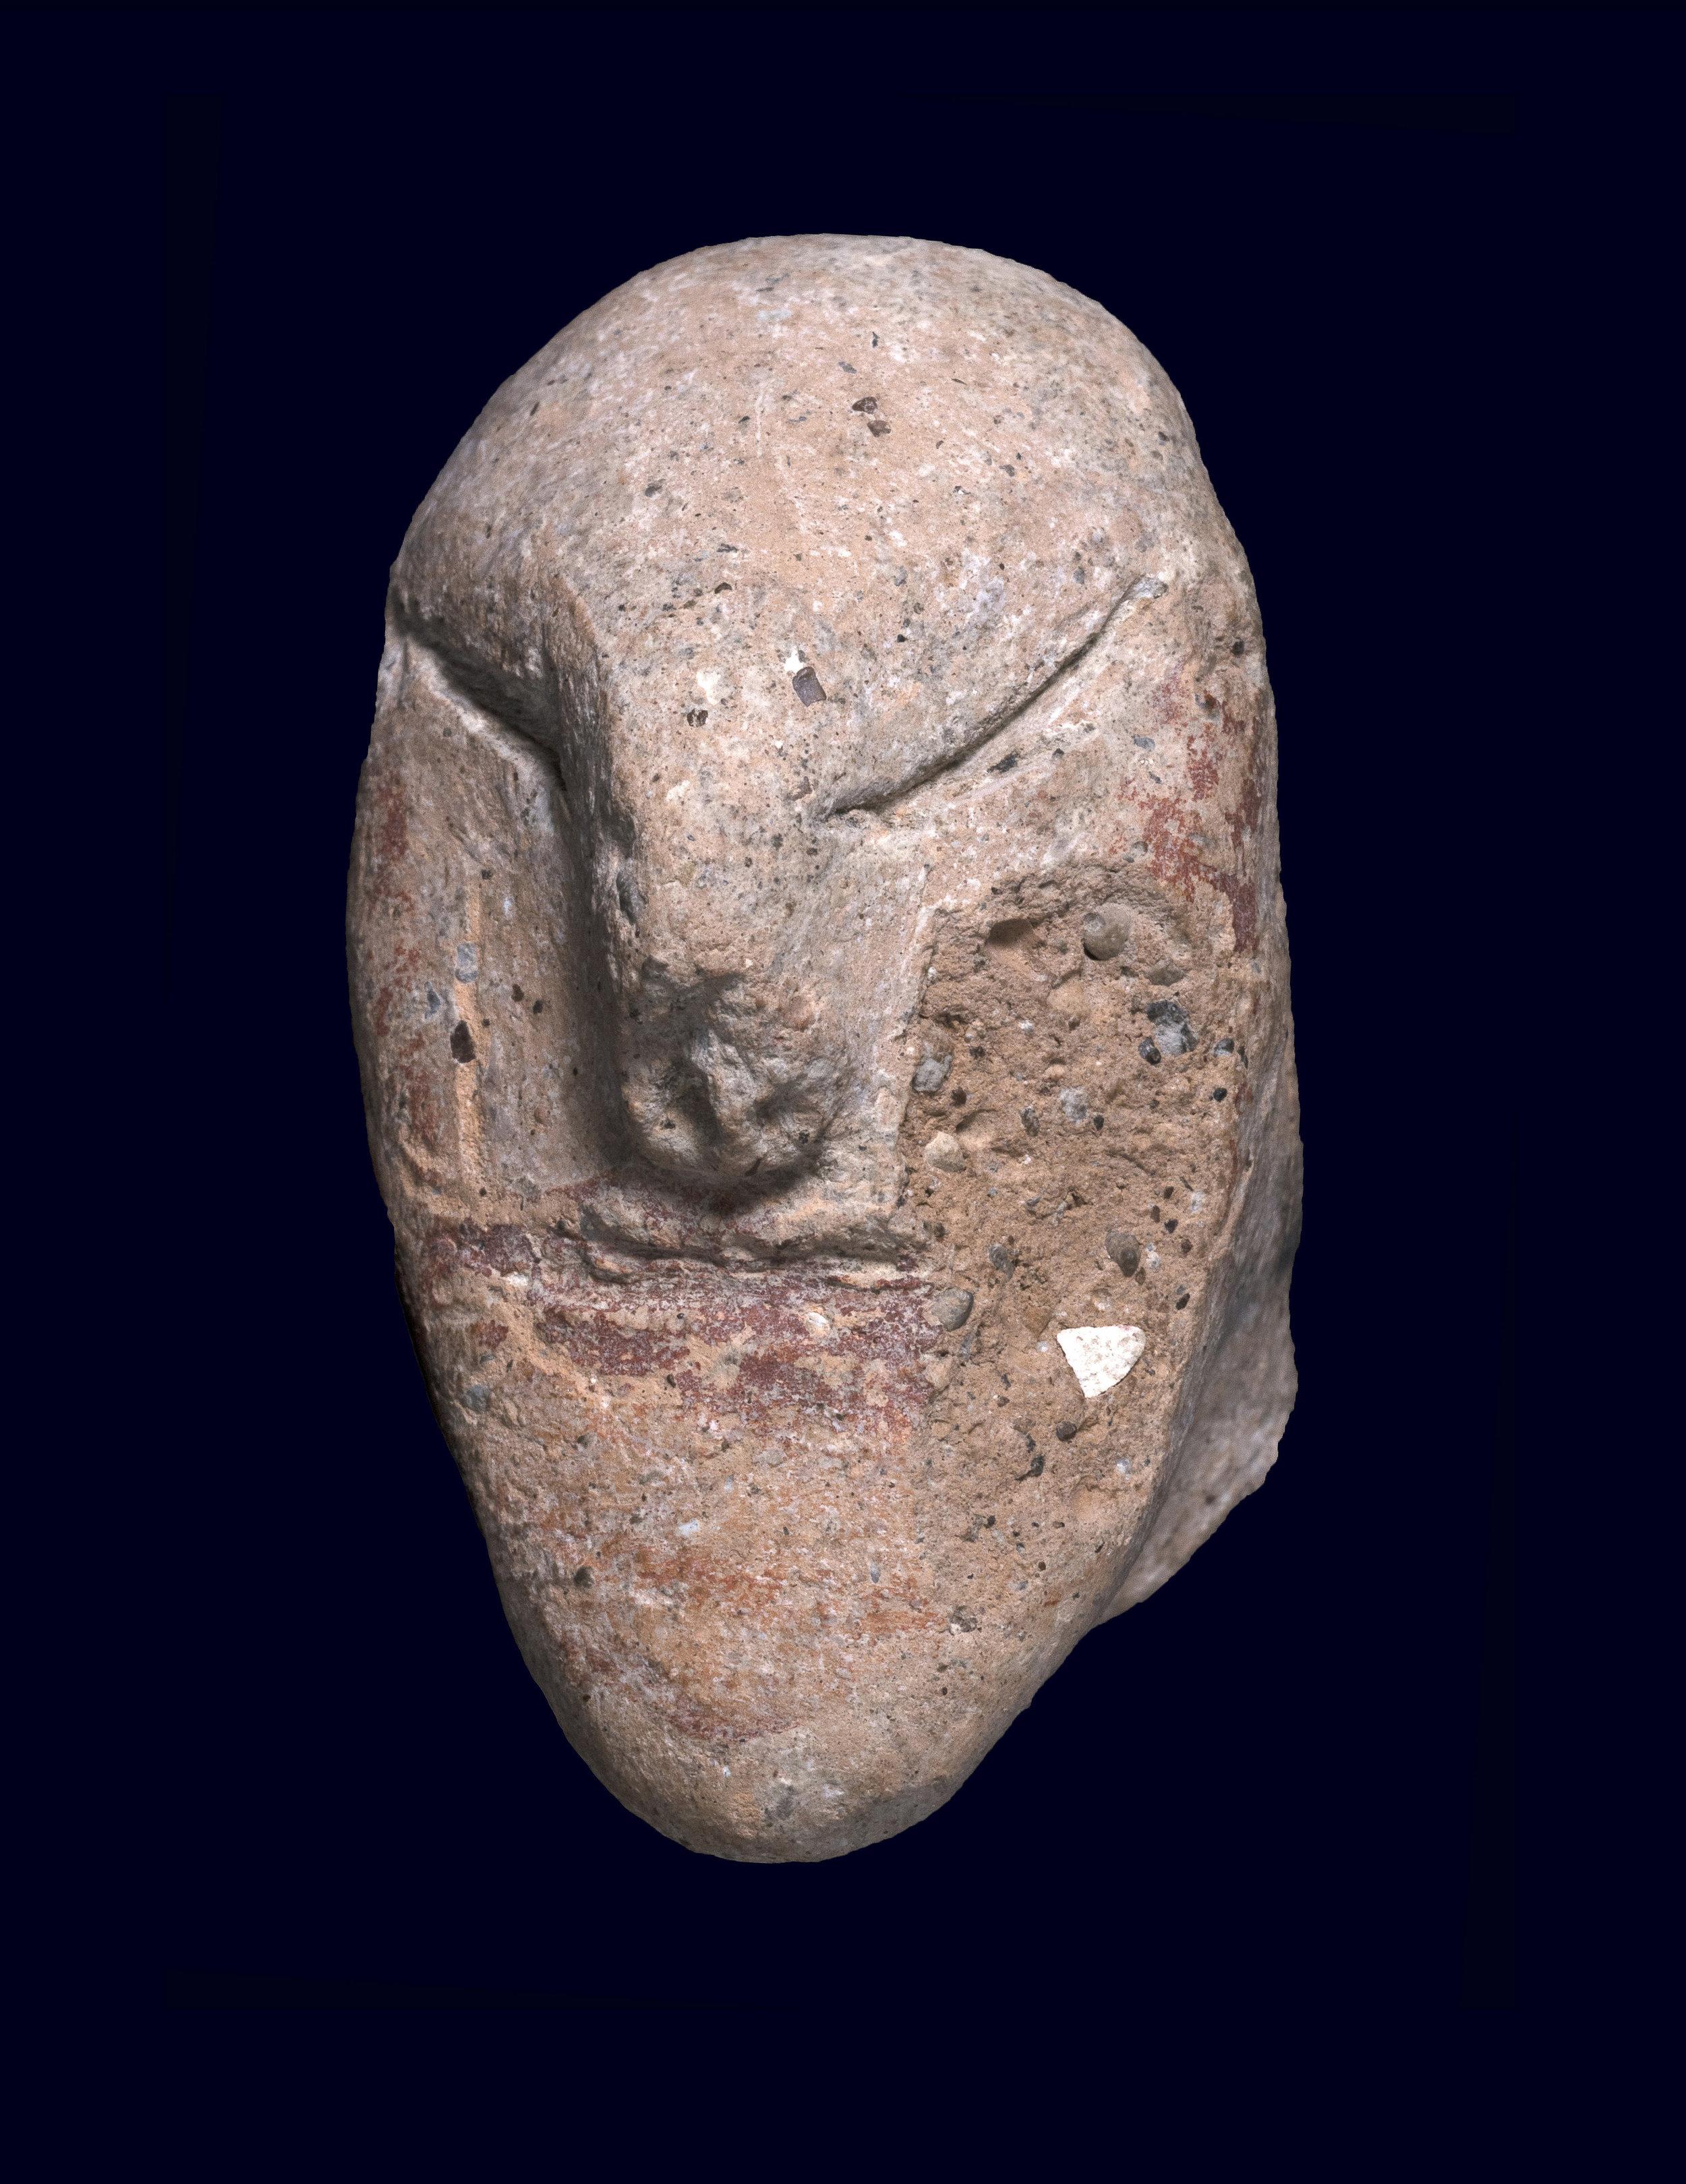 Photo: Clara Amit, Courtesy of the Israel Antiquities Authority